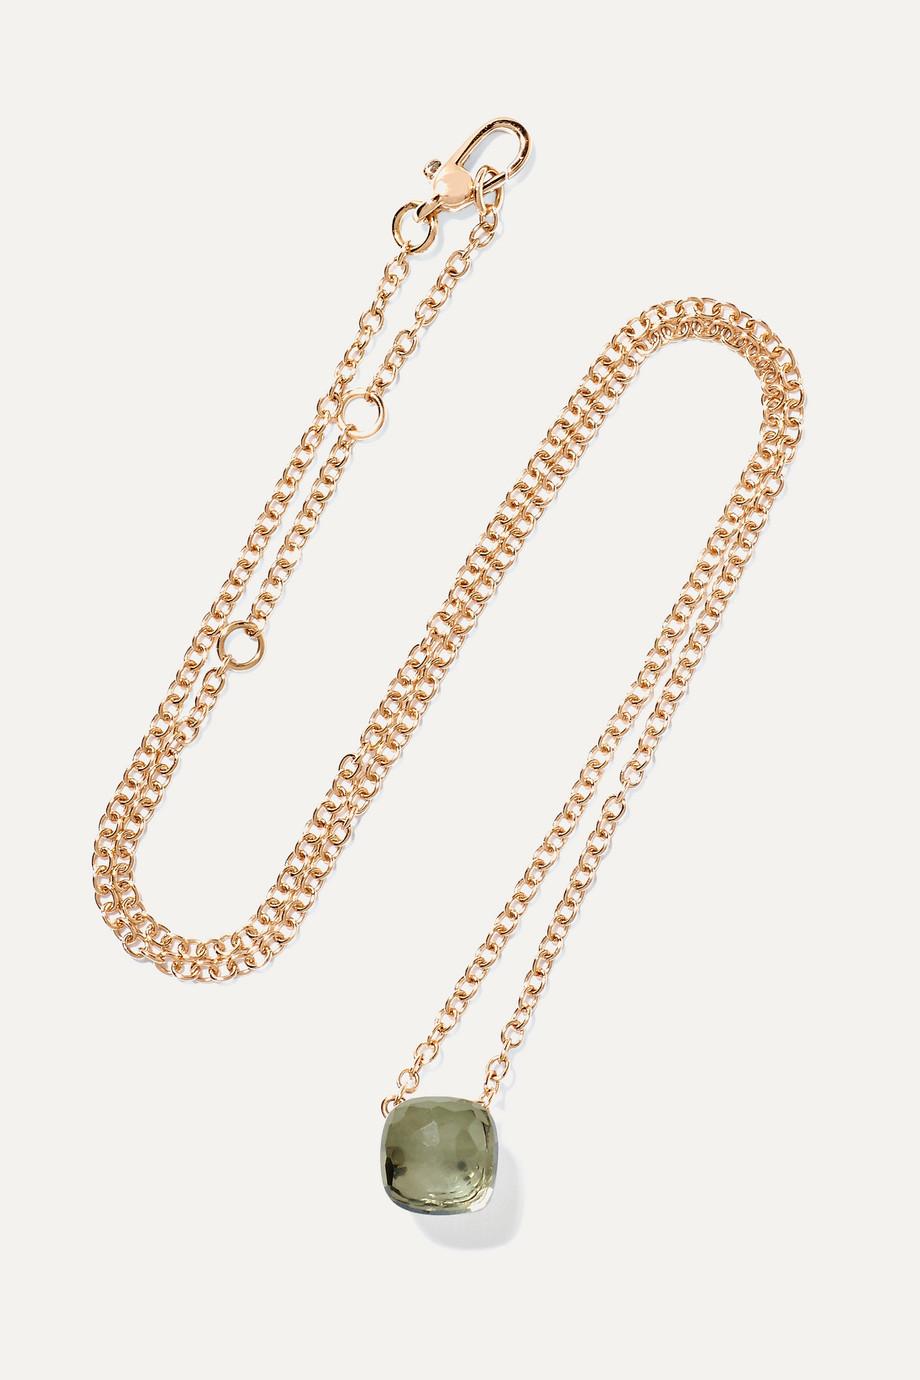 Pomellato Nudo 18-karat white and rose gold prasiolite necklace